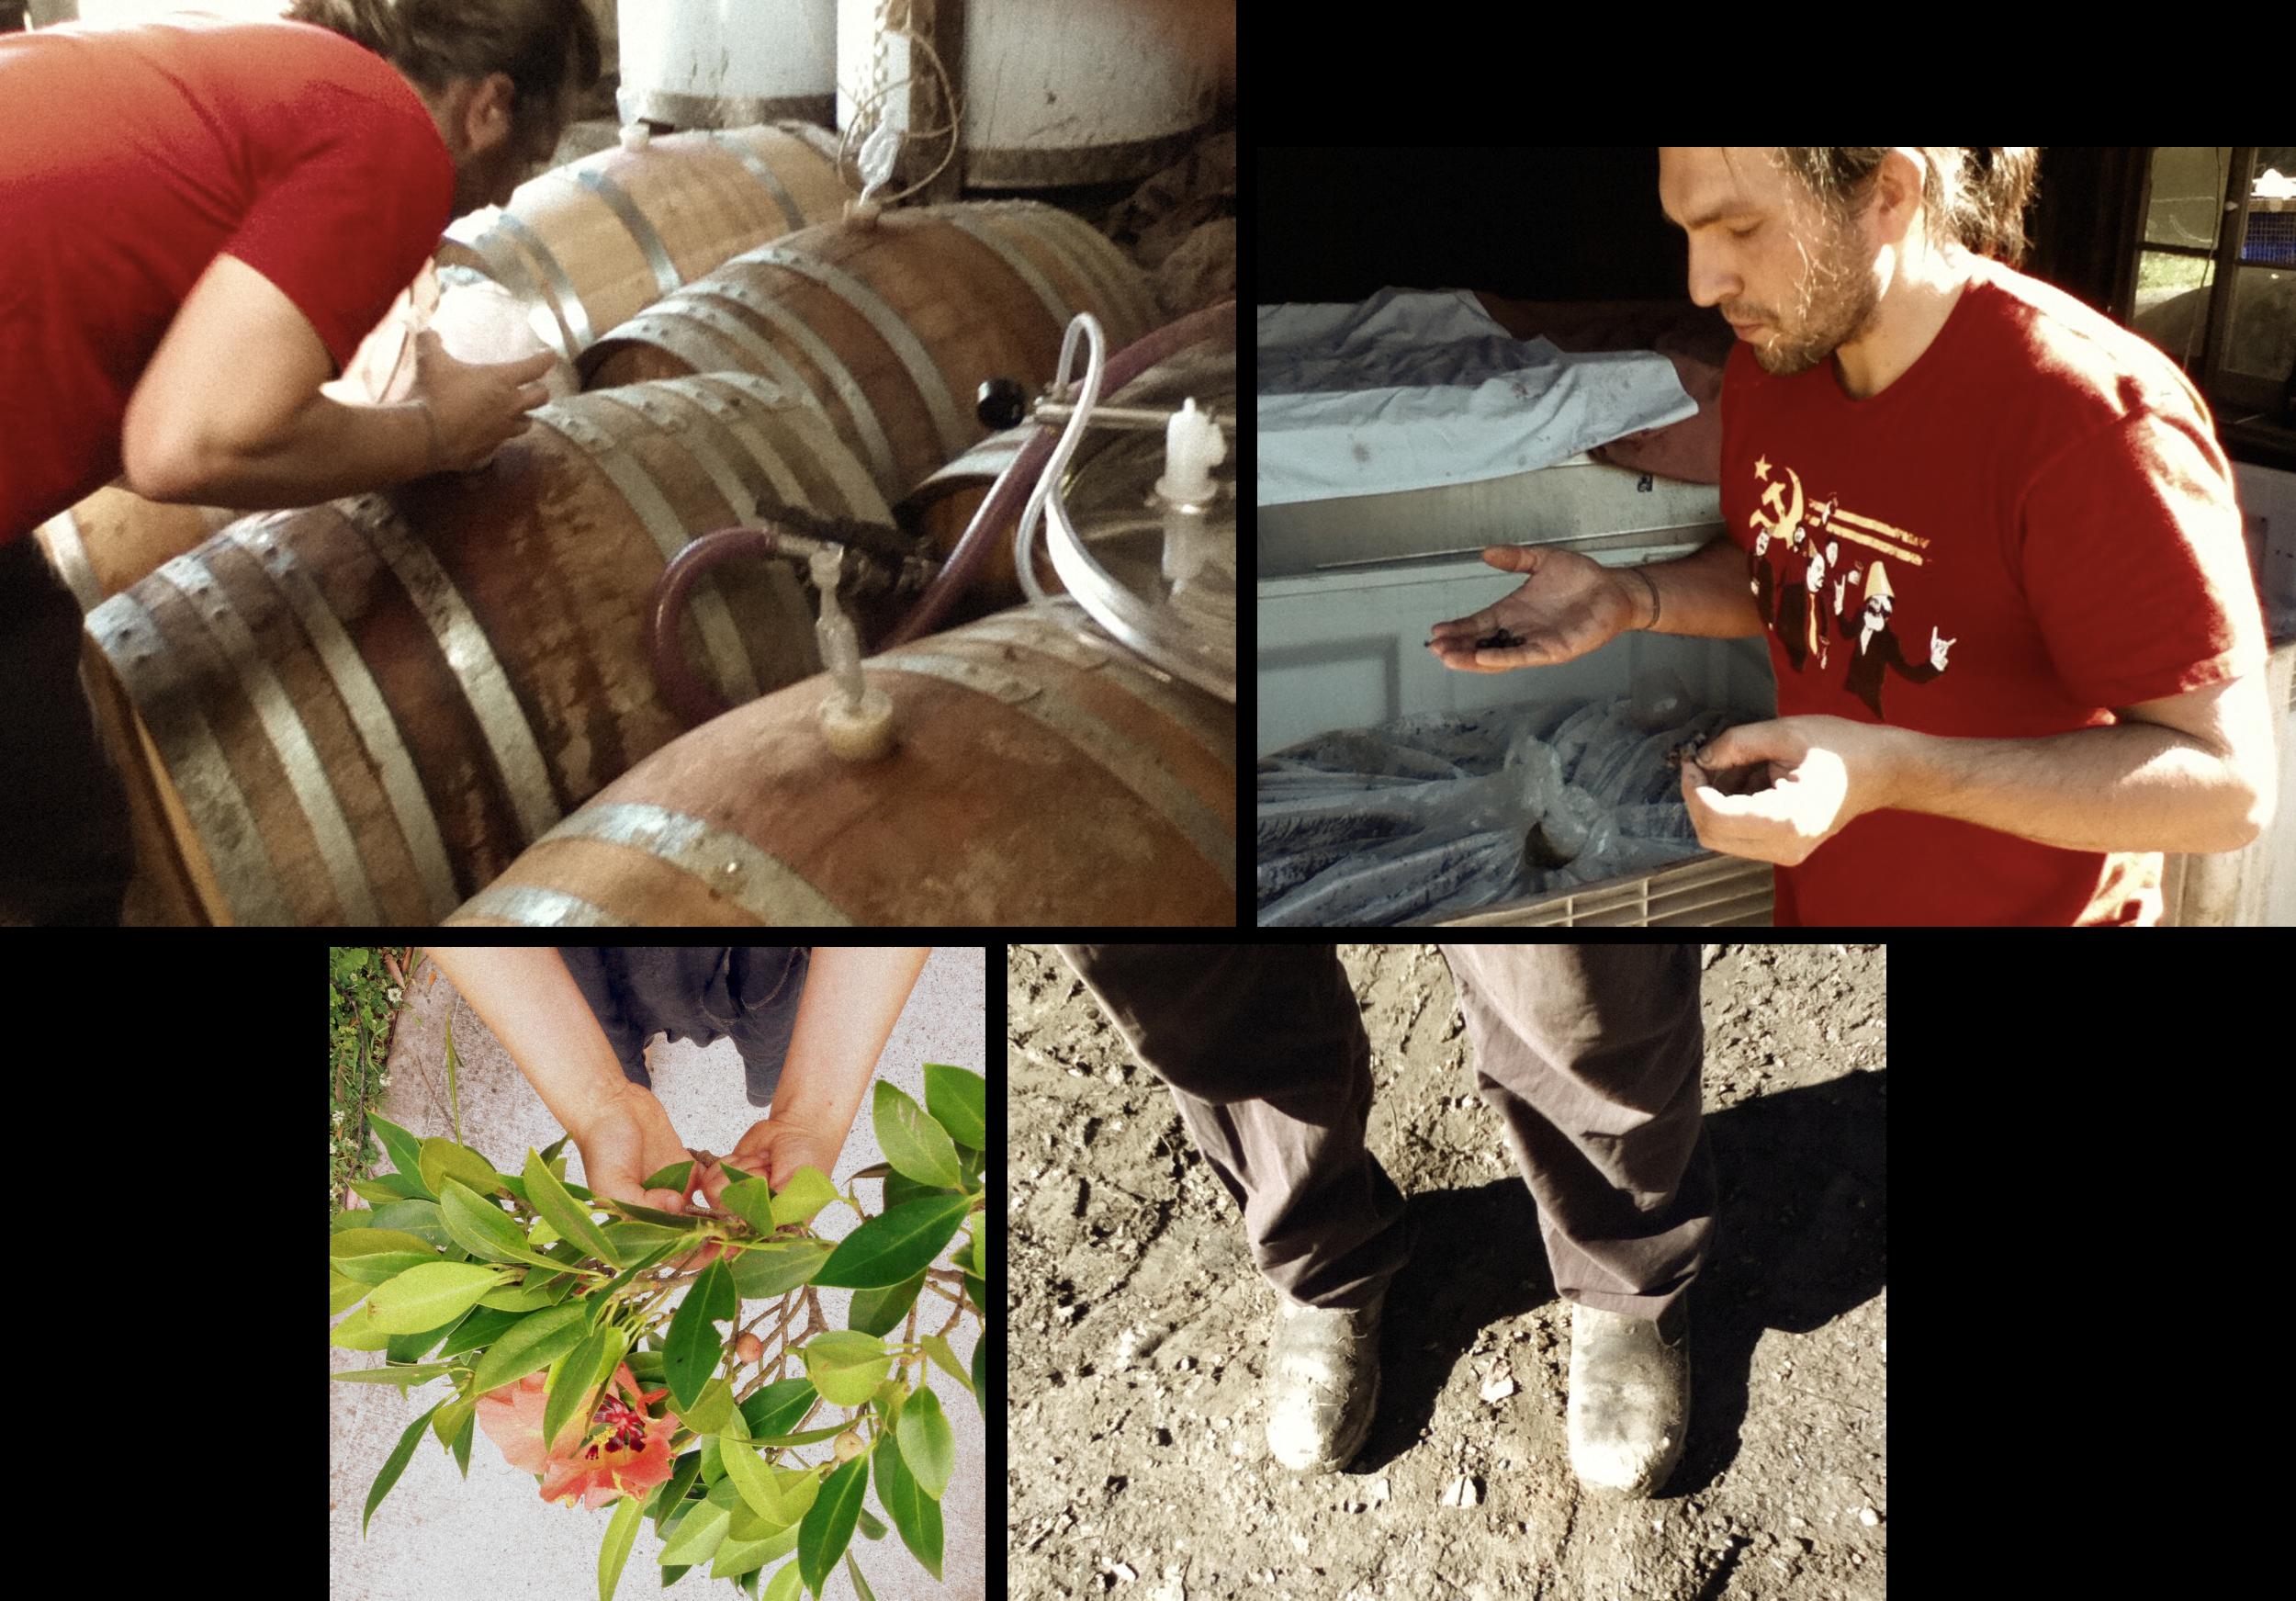 The Other Right Wines - Winemaker Alex Schulkin